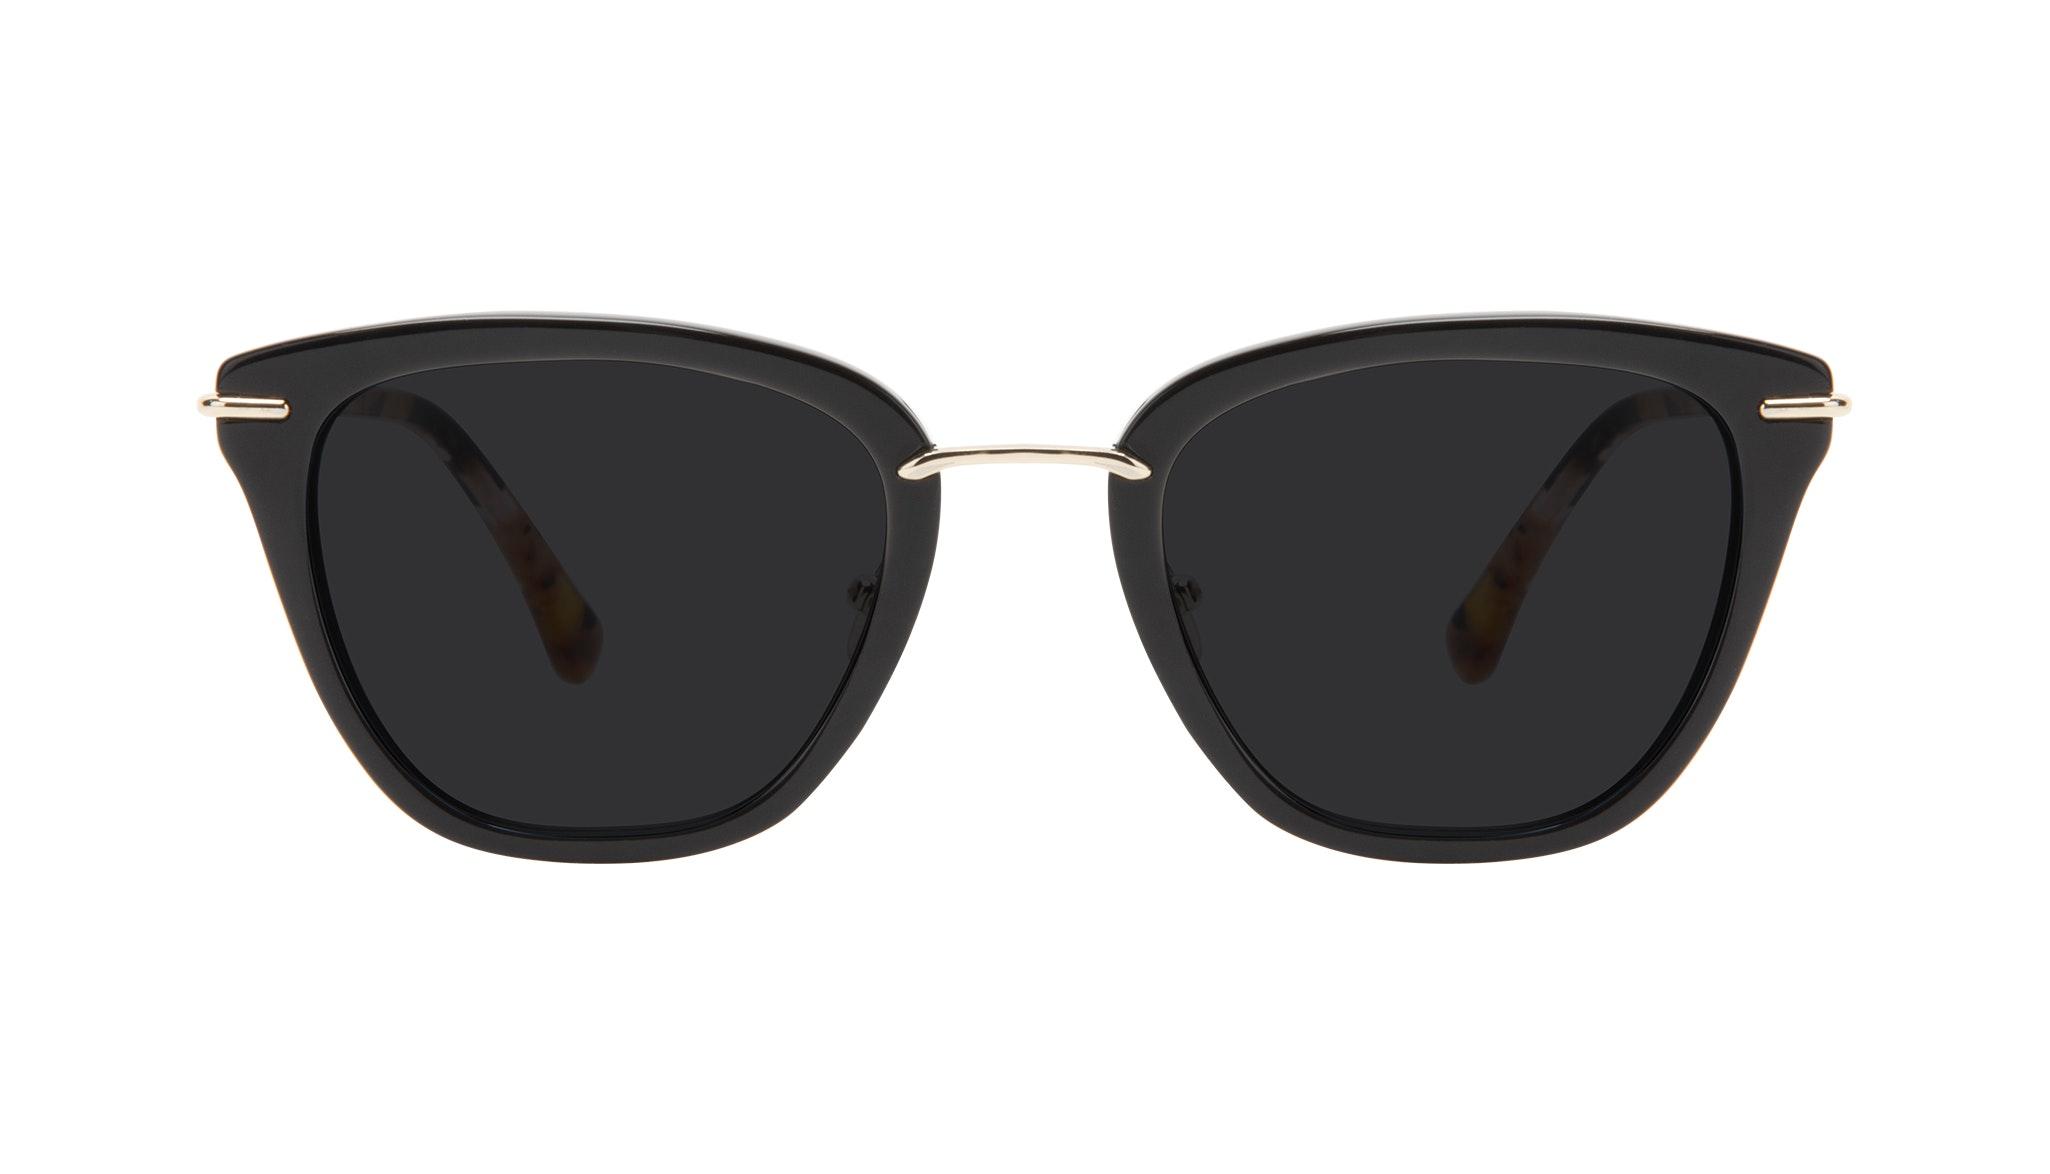 Affordable Fashion Glasses Square Sunglasses Women Flirt Ebony Front